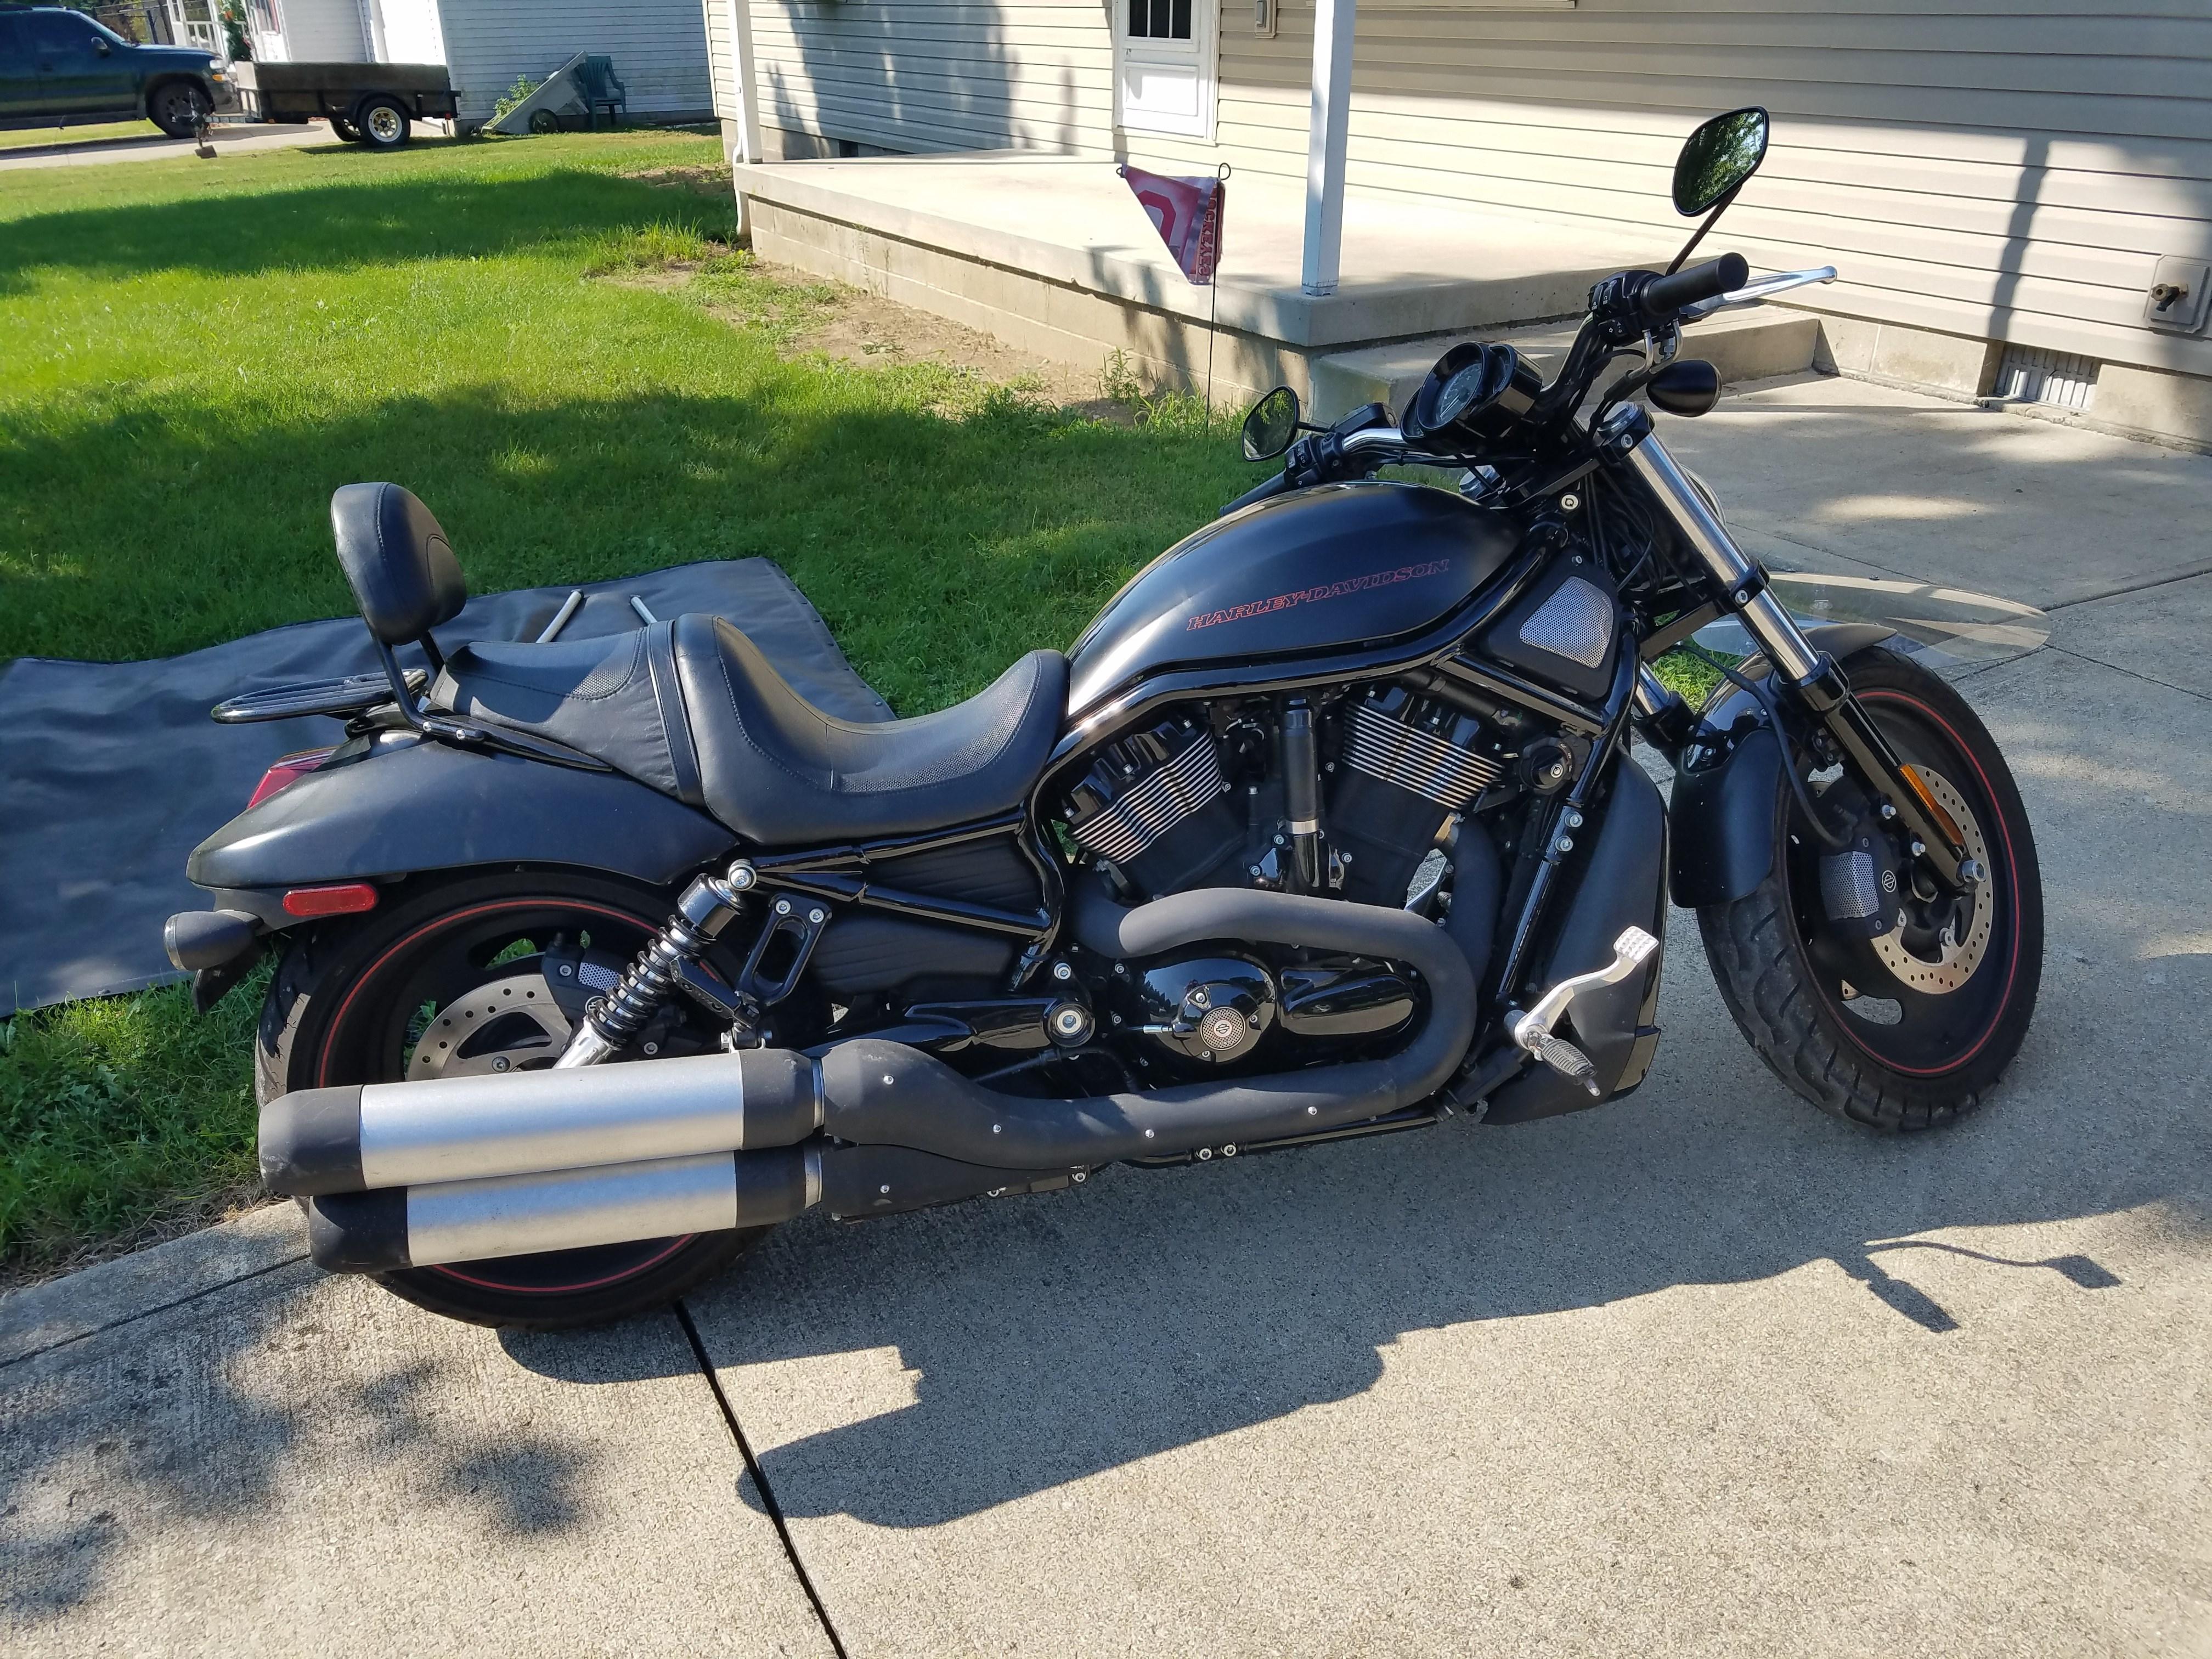 2008 Harley Davidson 174 Vrscdx V Rod 174 Night Rod 174 Special